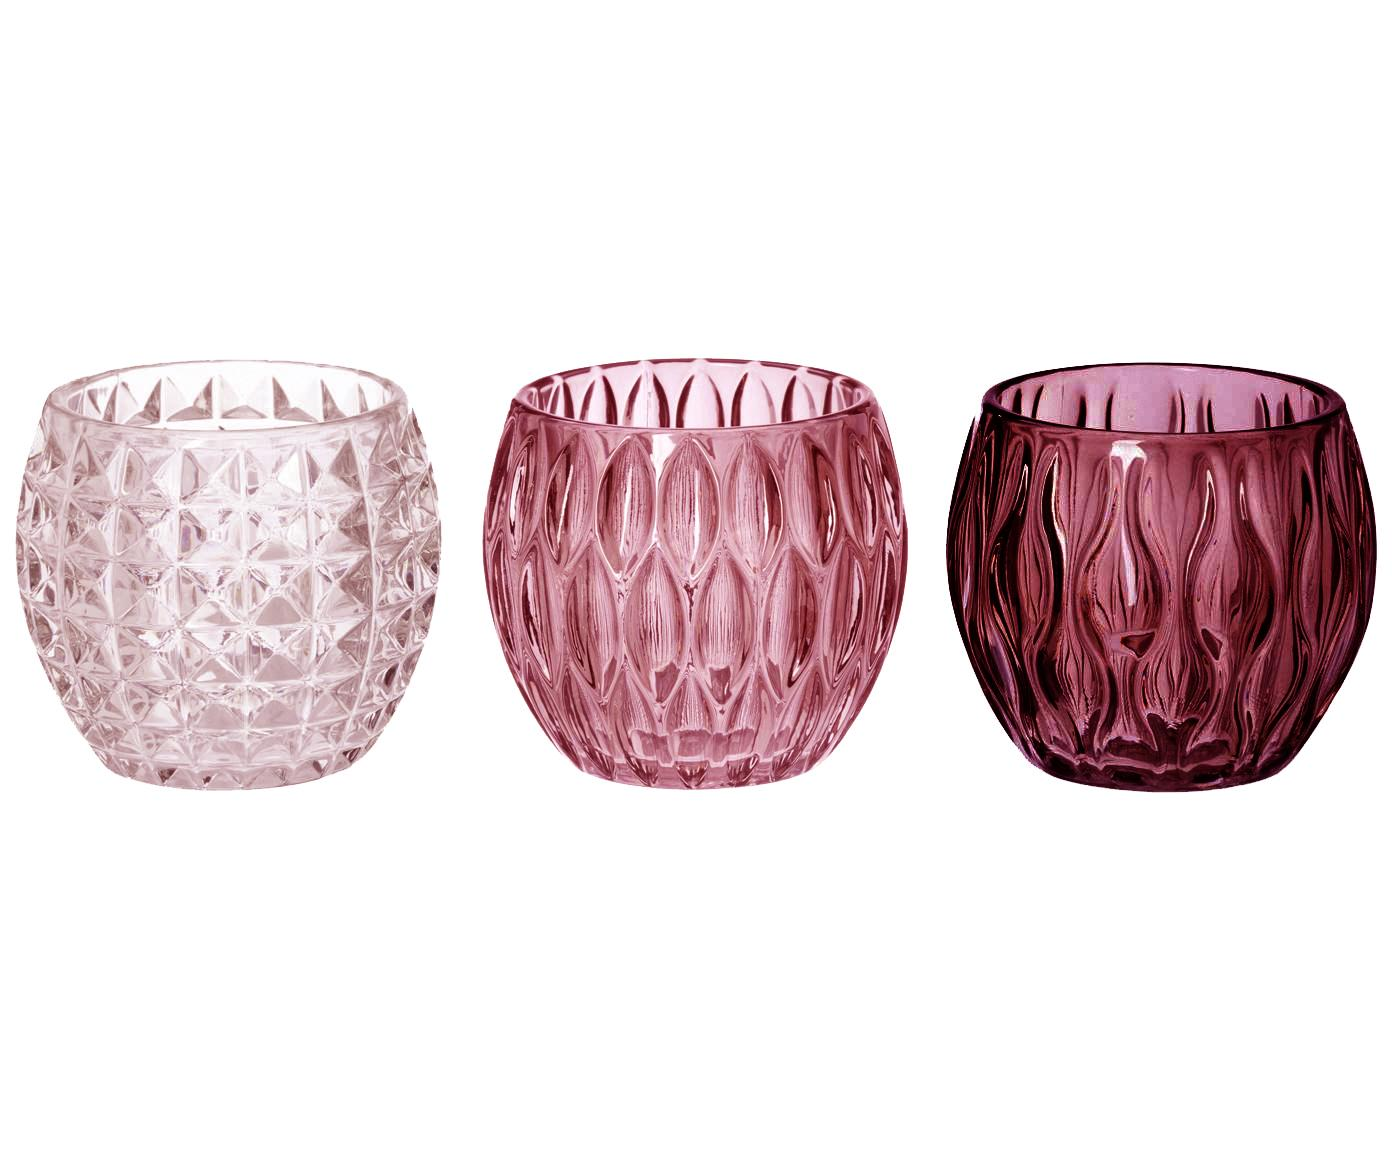 Waxinelichthoudersset Aliza, 3-delig, Glas, Rozetinten, transparant, Ø 10 x H 9 cm